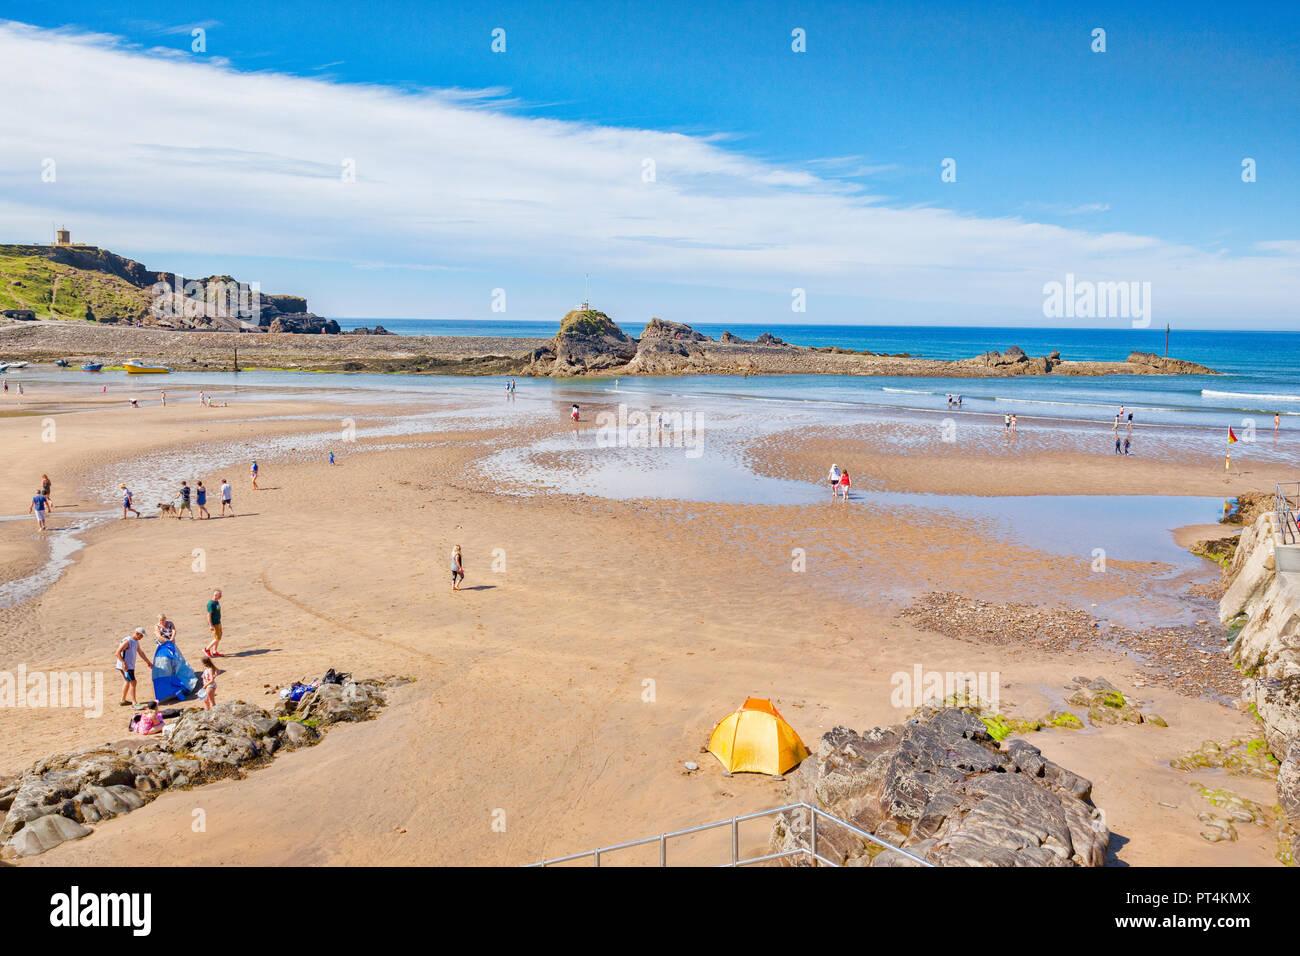 30 June 2018: Bude, Cornwall, UK -  Summerleaze  beach during the June heatwave. - Stock Image